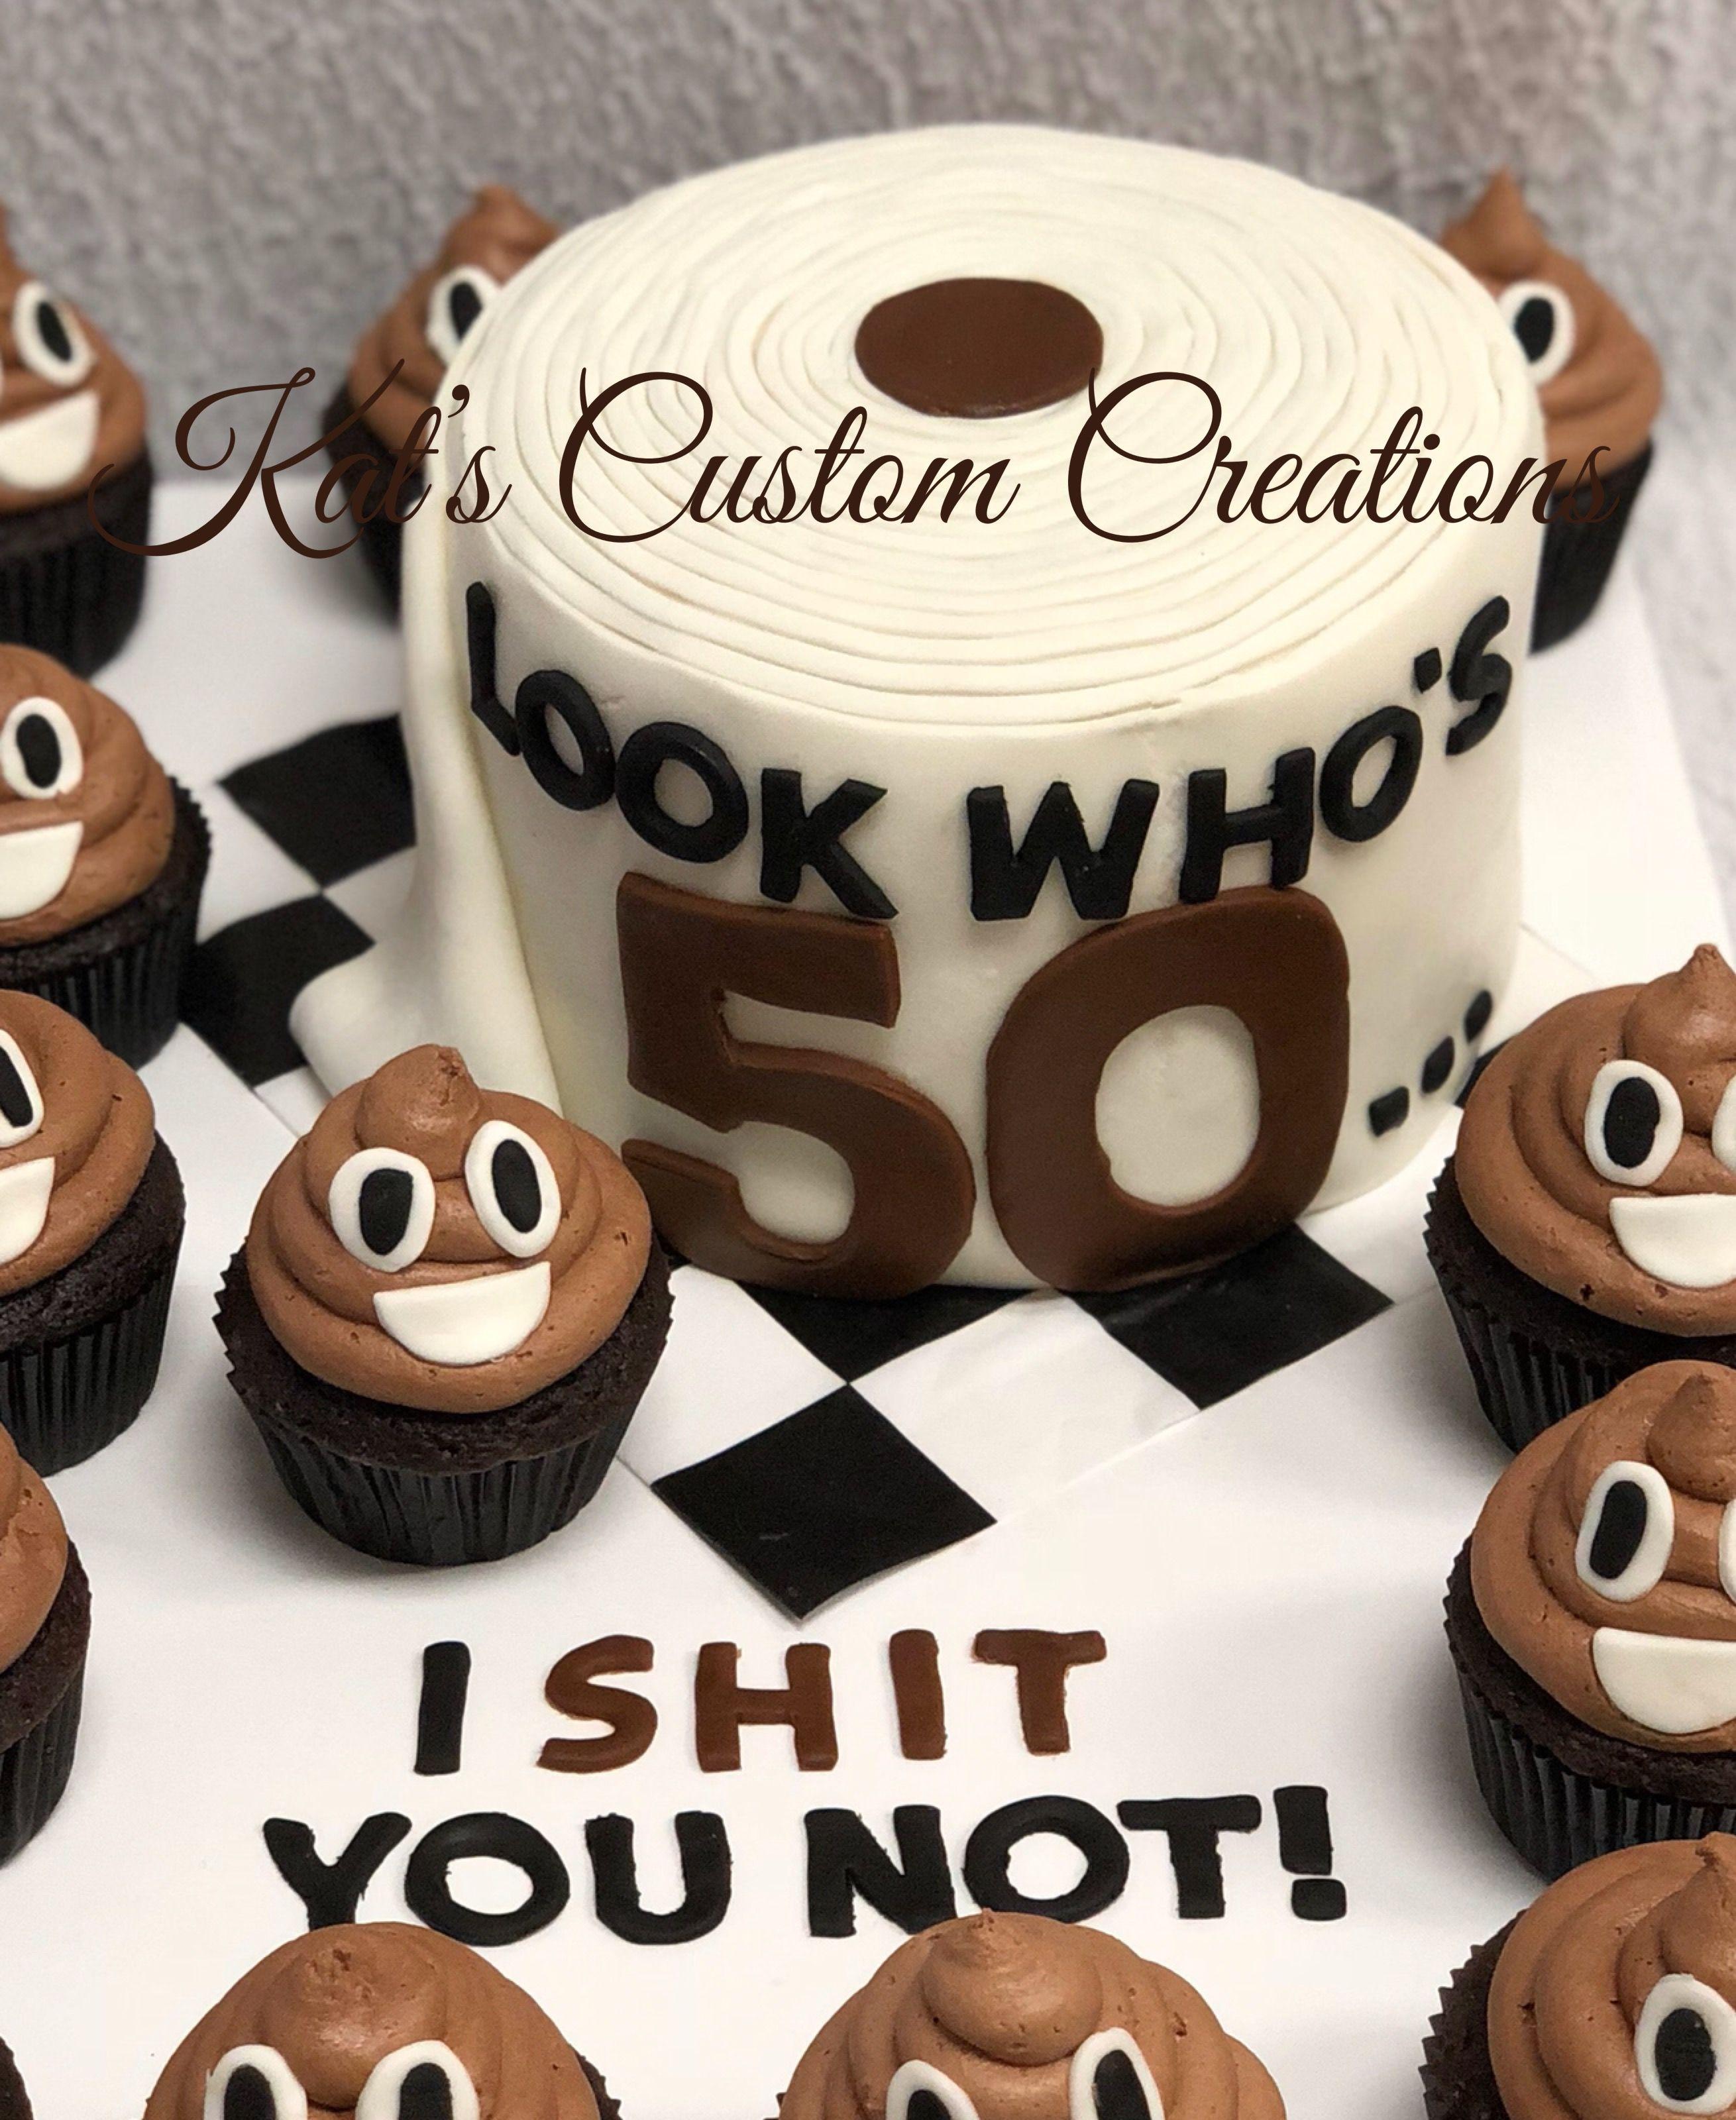 Toilet Paper Cake With Emoji Poop Cupcakes Mens 50th Birthday Cakes 40th